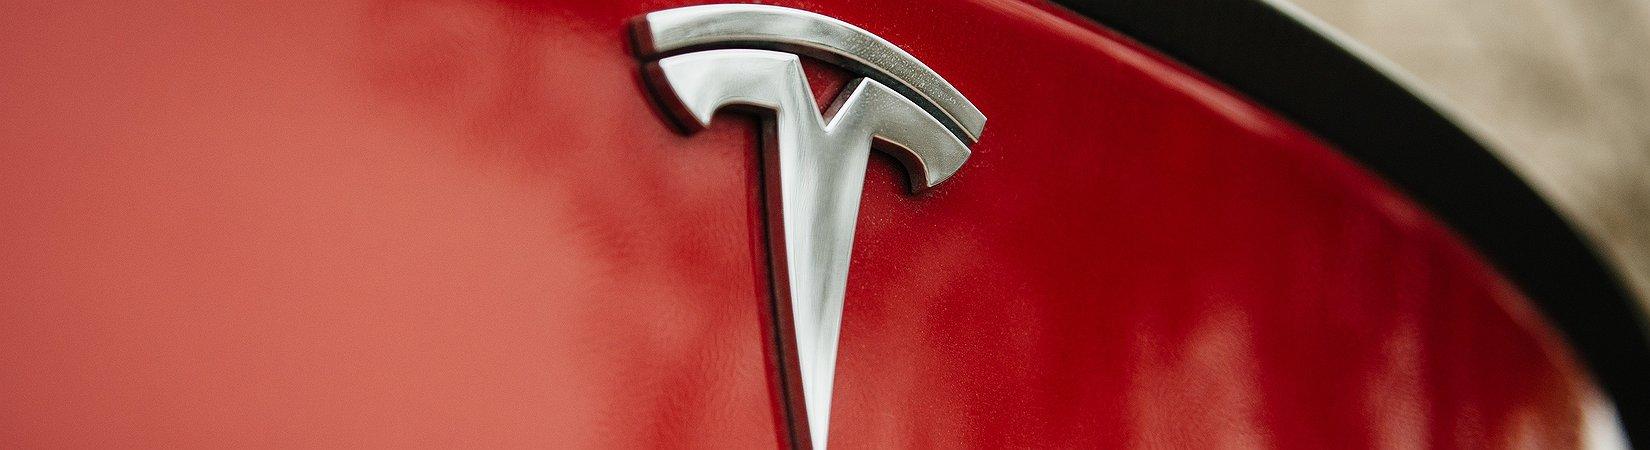 Tesla nähert sich dem Publikum